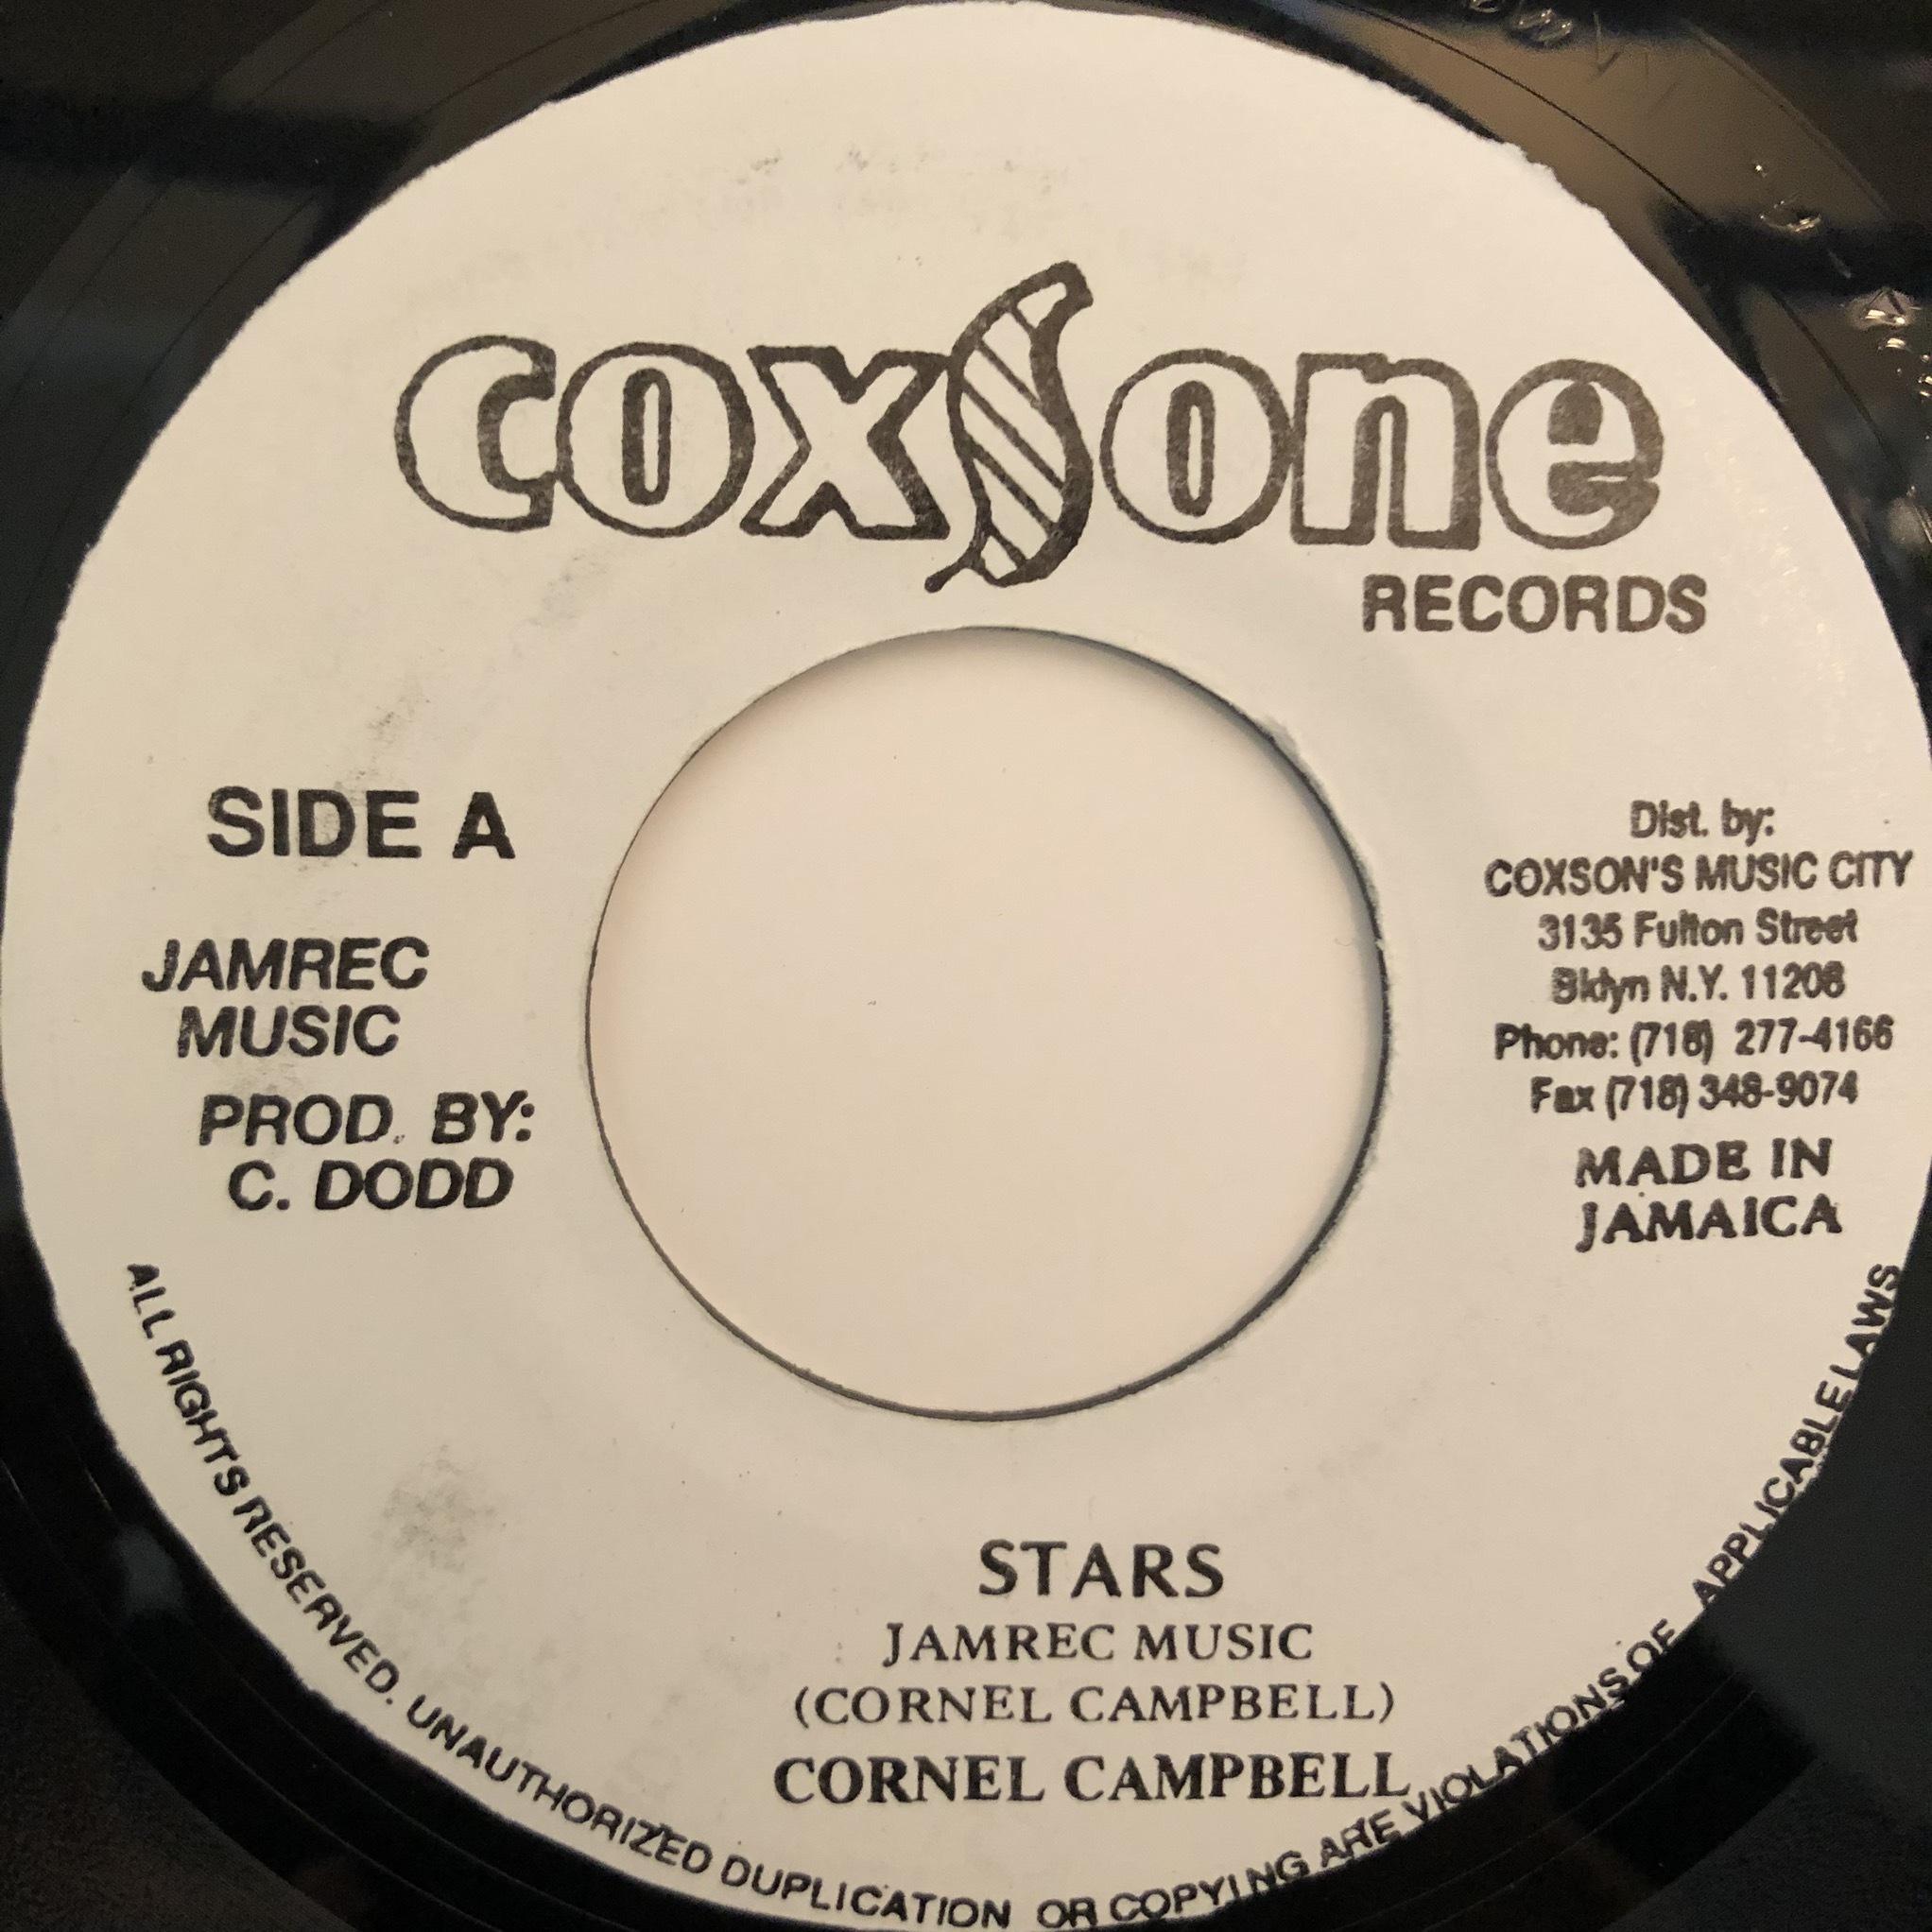 Cornell Campbell - Stars【7-20349】